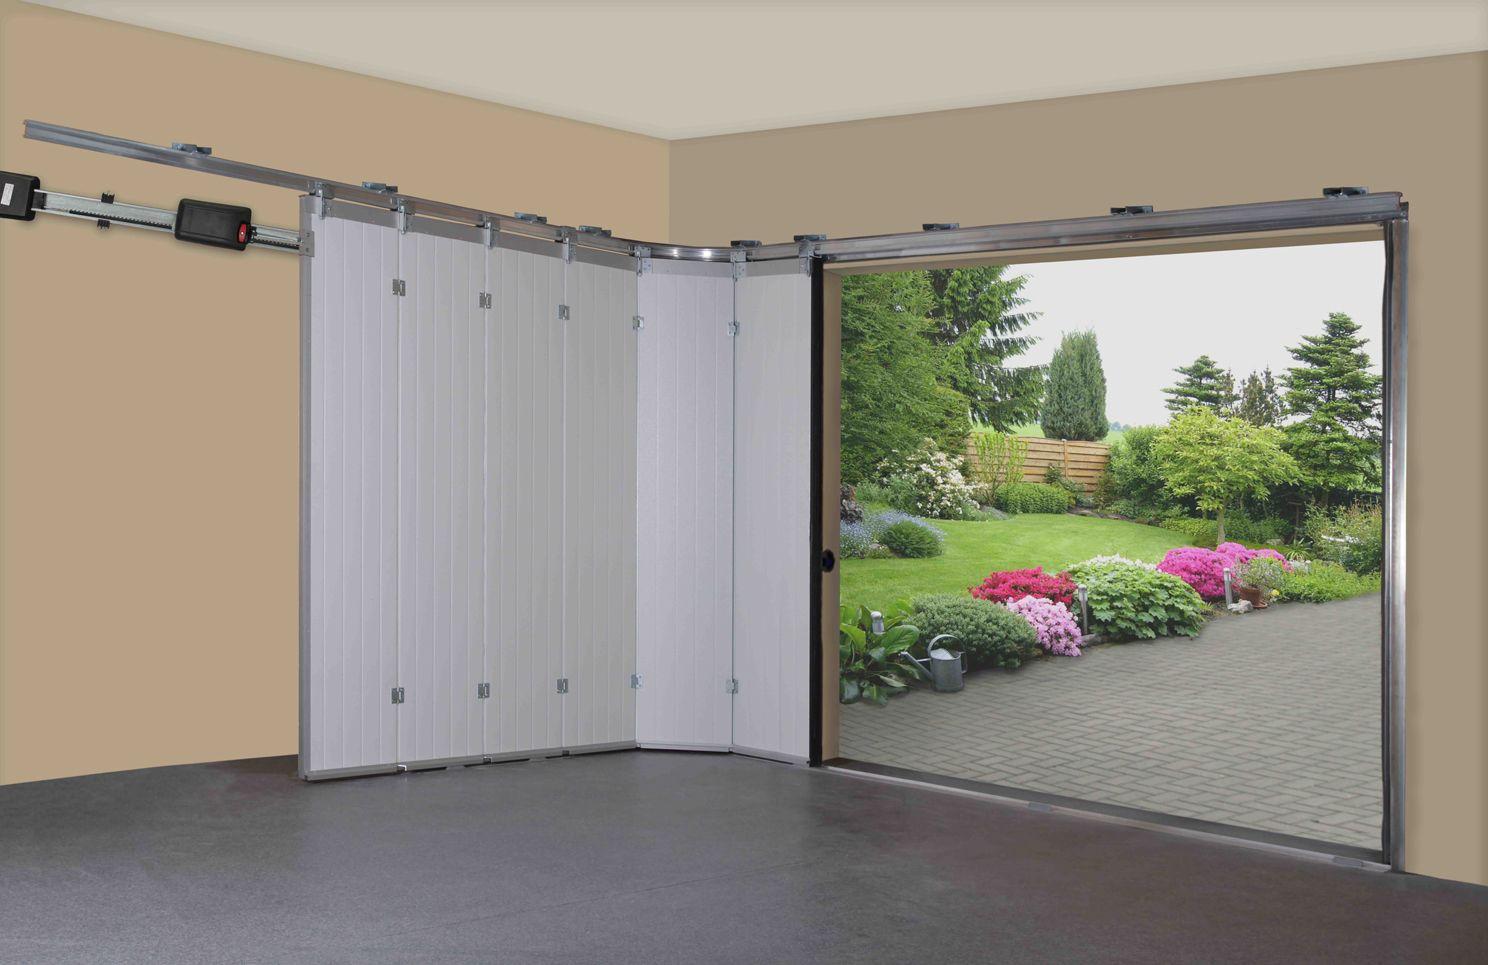 Sliding Garage Doors Garage Decor And Designs Bifold Sliding